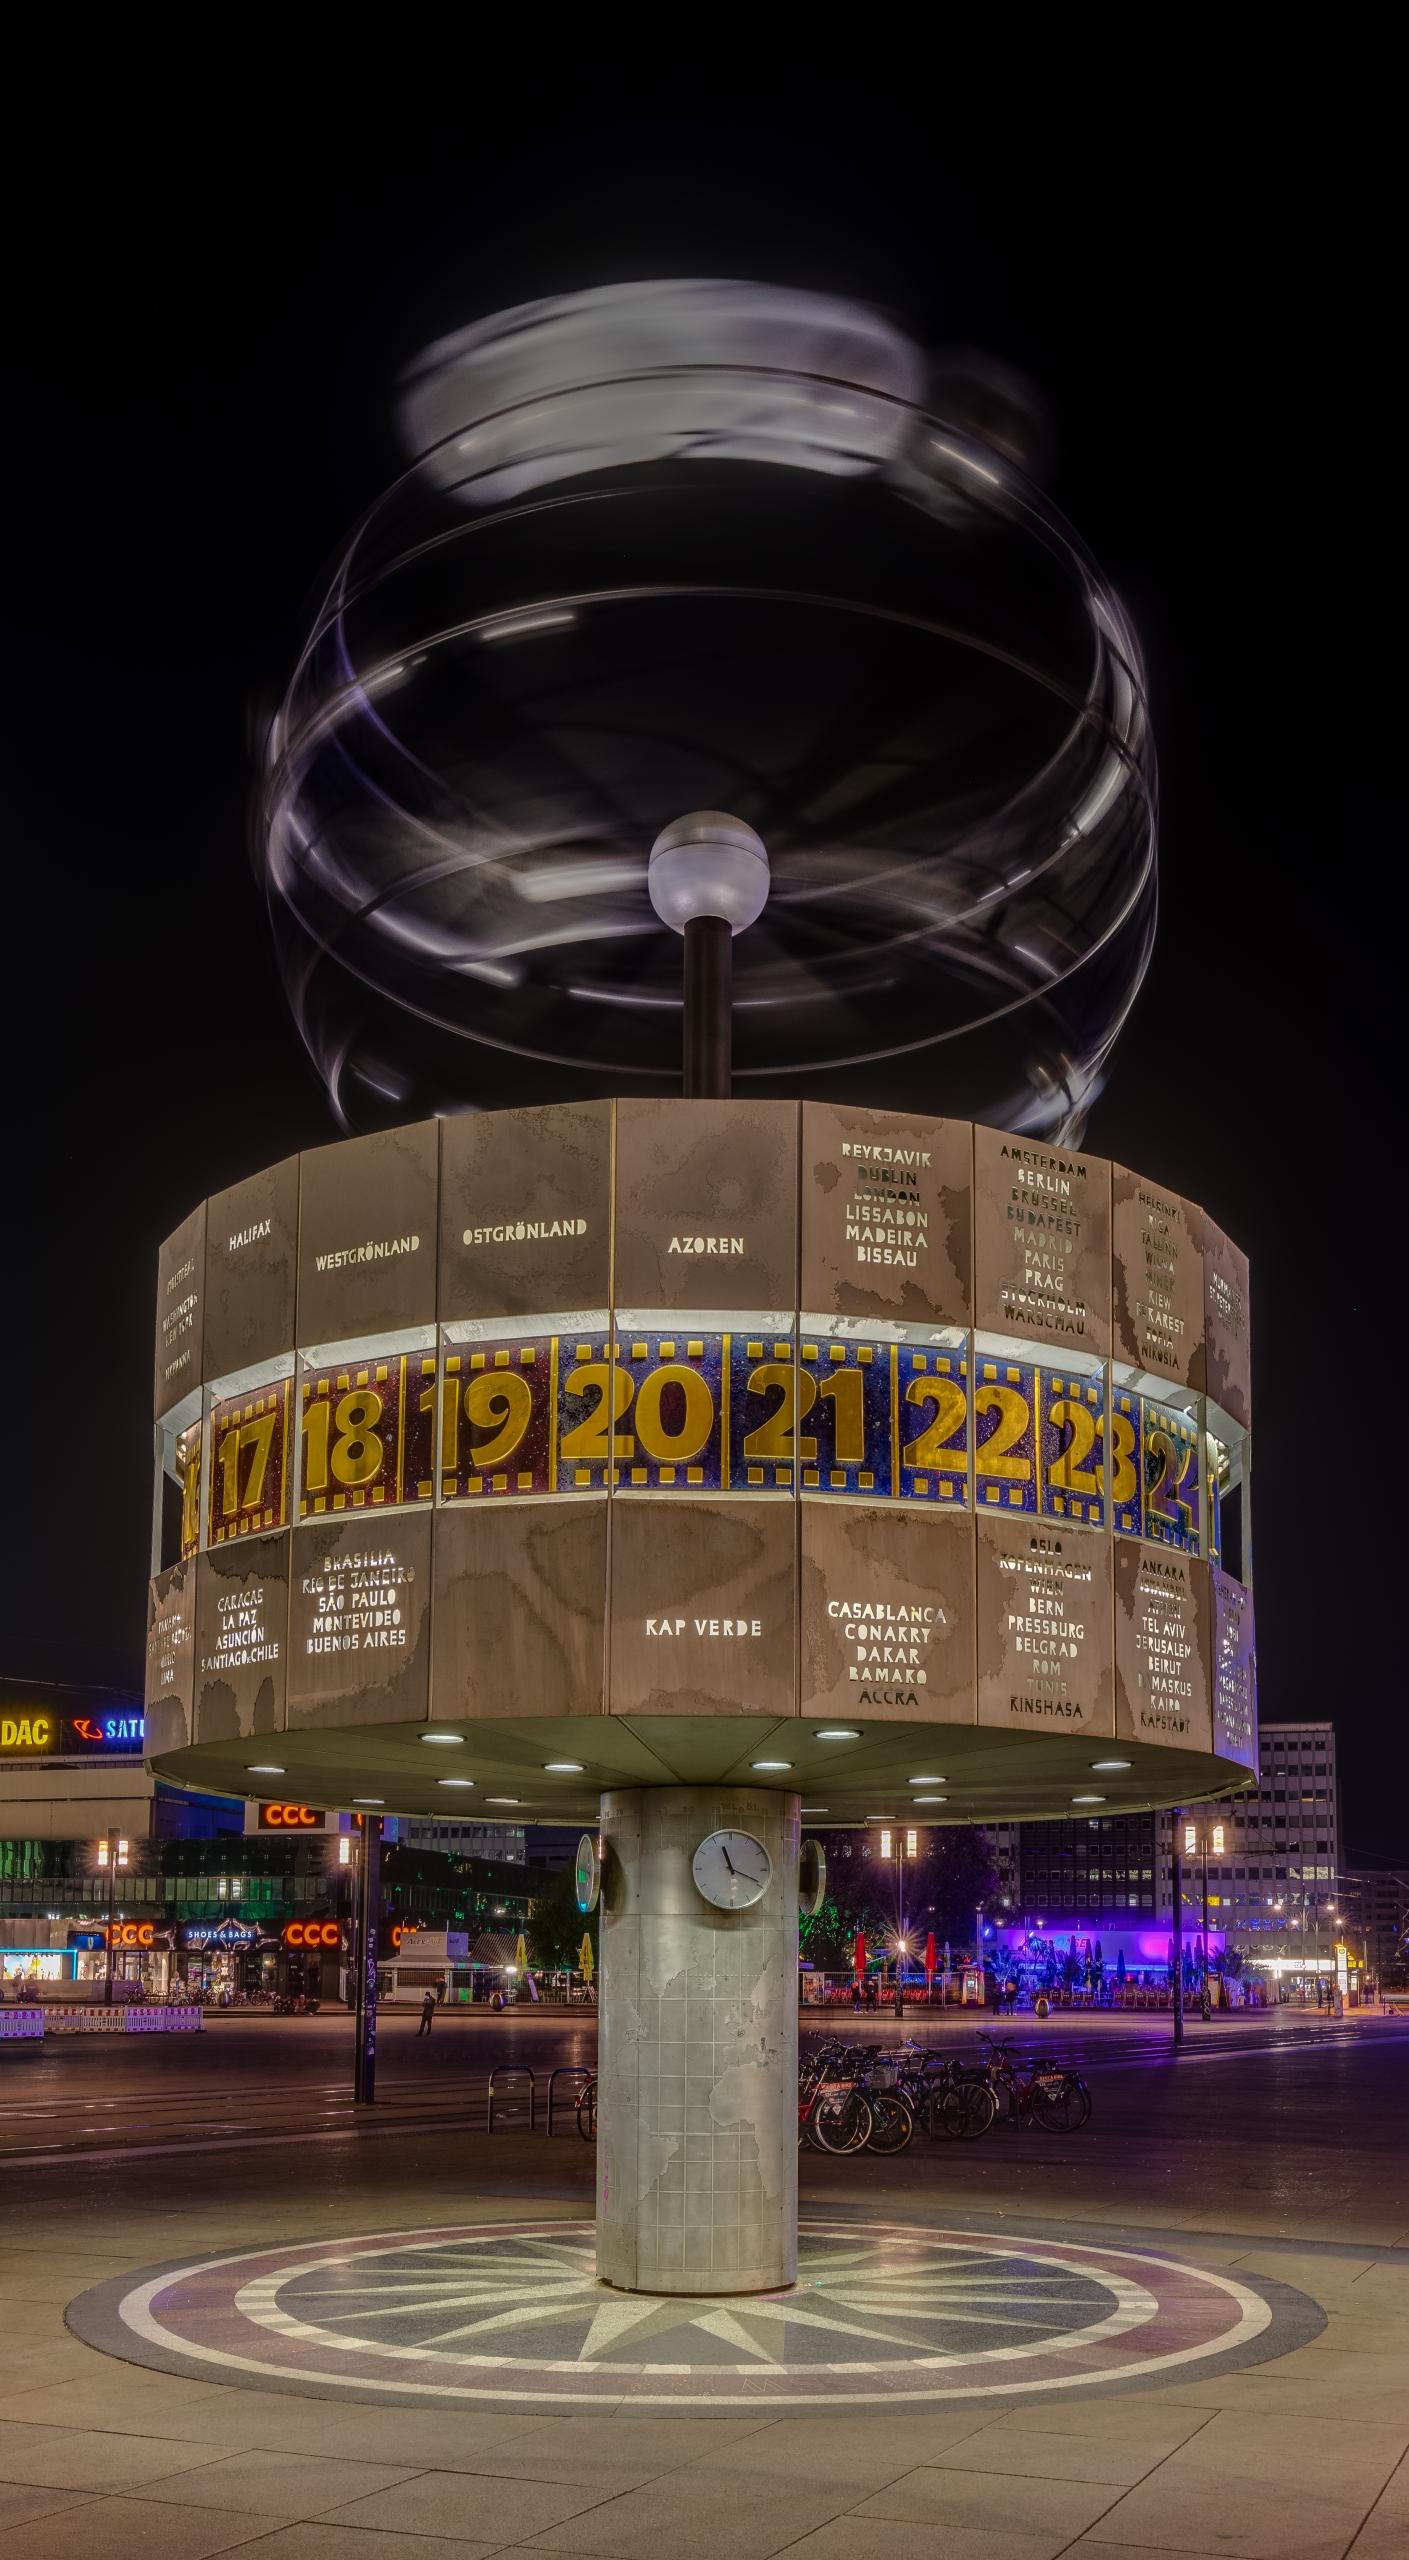 el-reloj-mundial